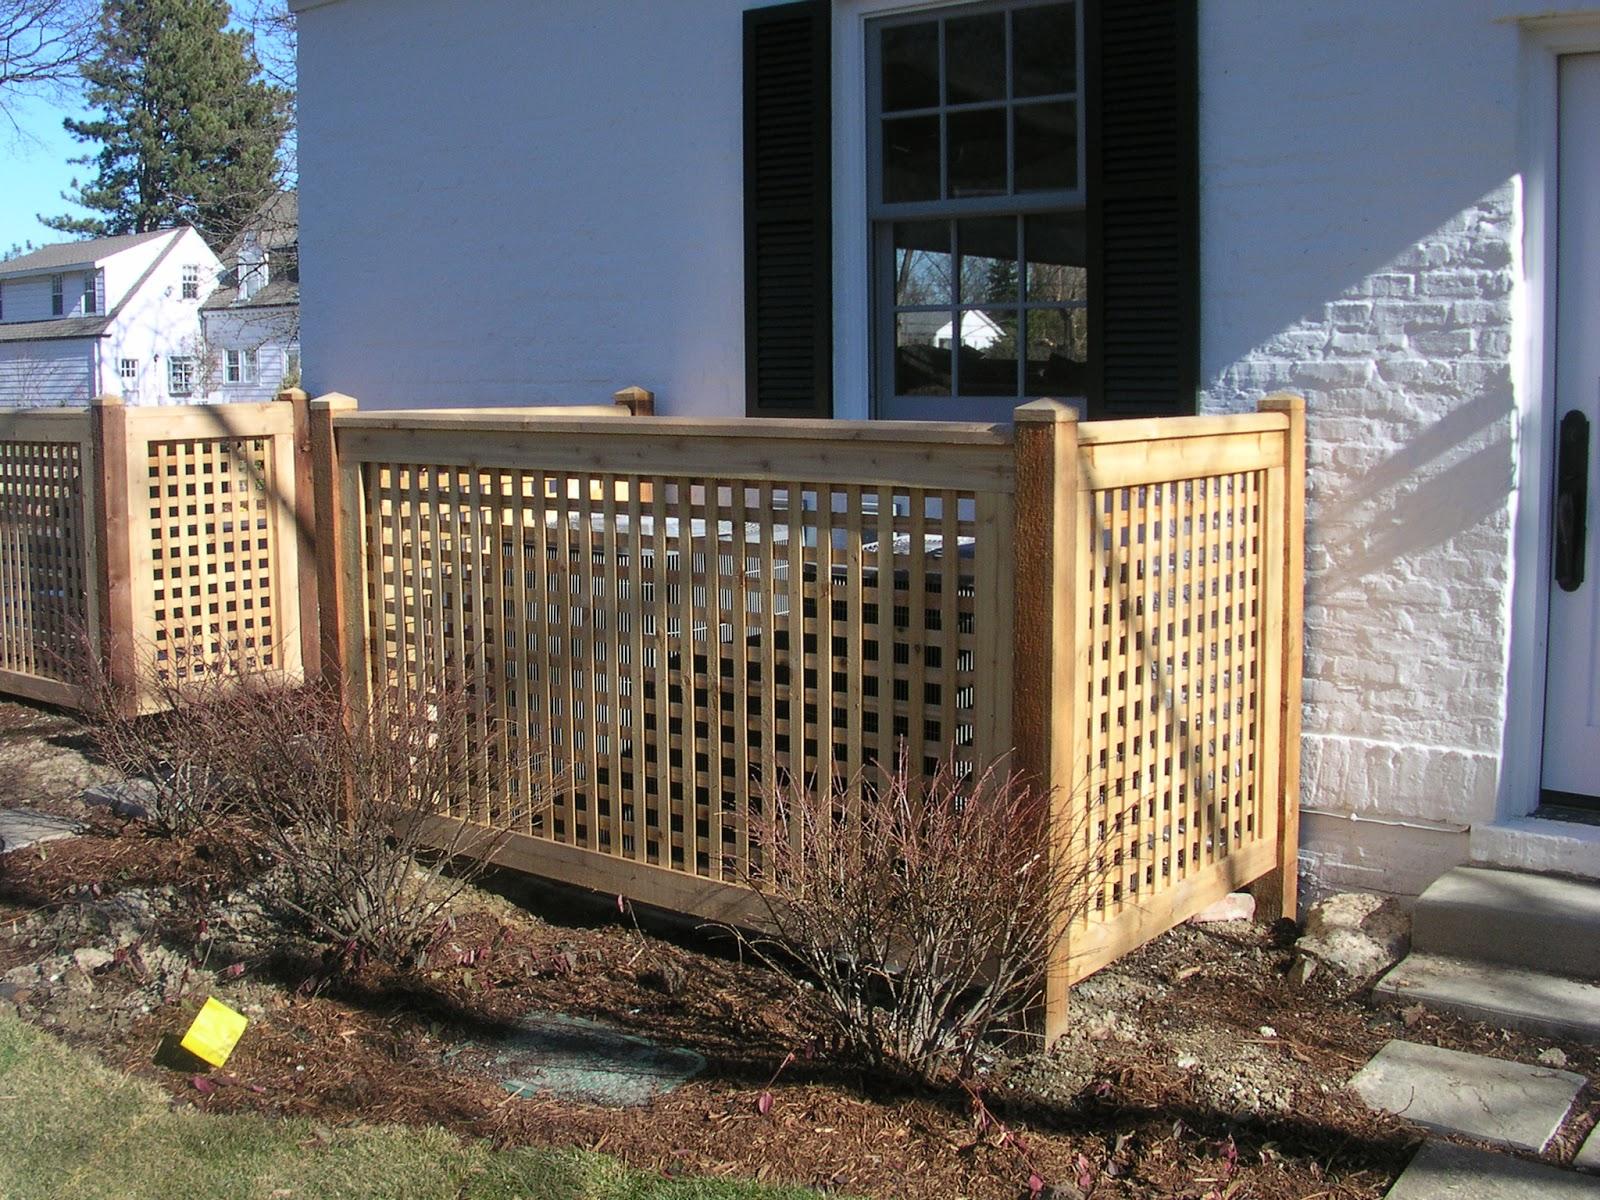 fence utility box cover fence free engine image for user. Black Bedroom Furniture Sets. Home Design Ideas